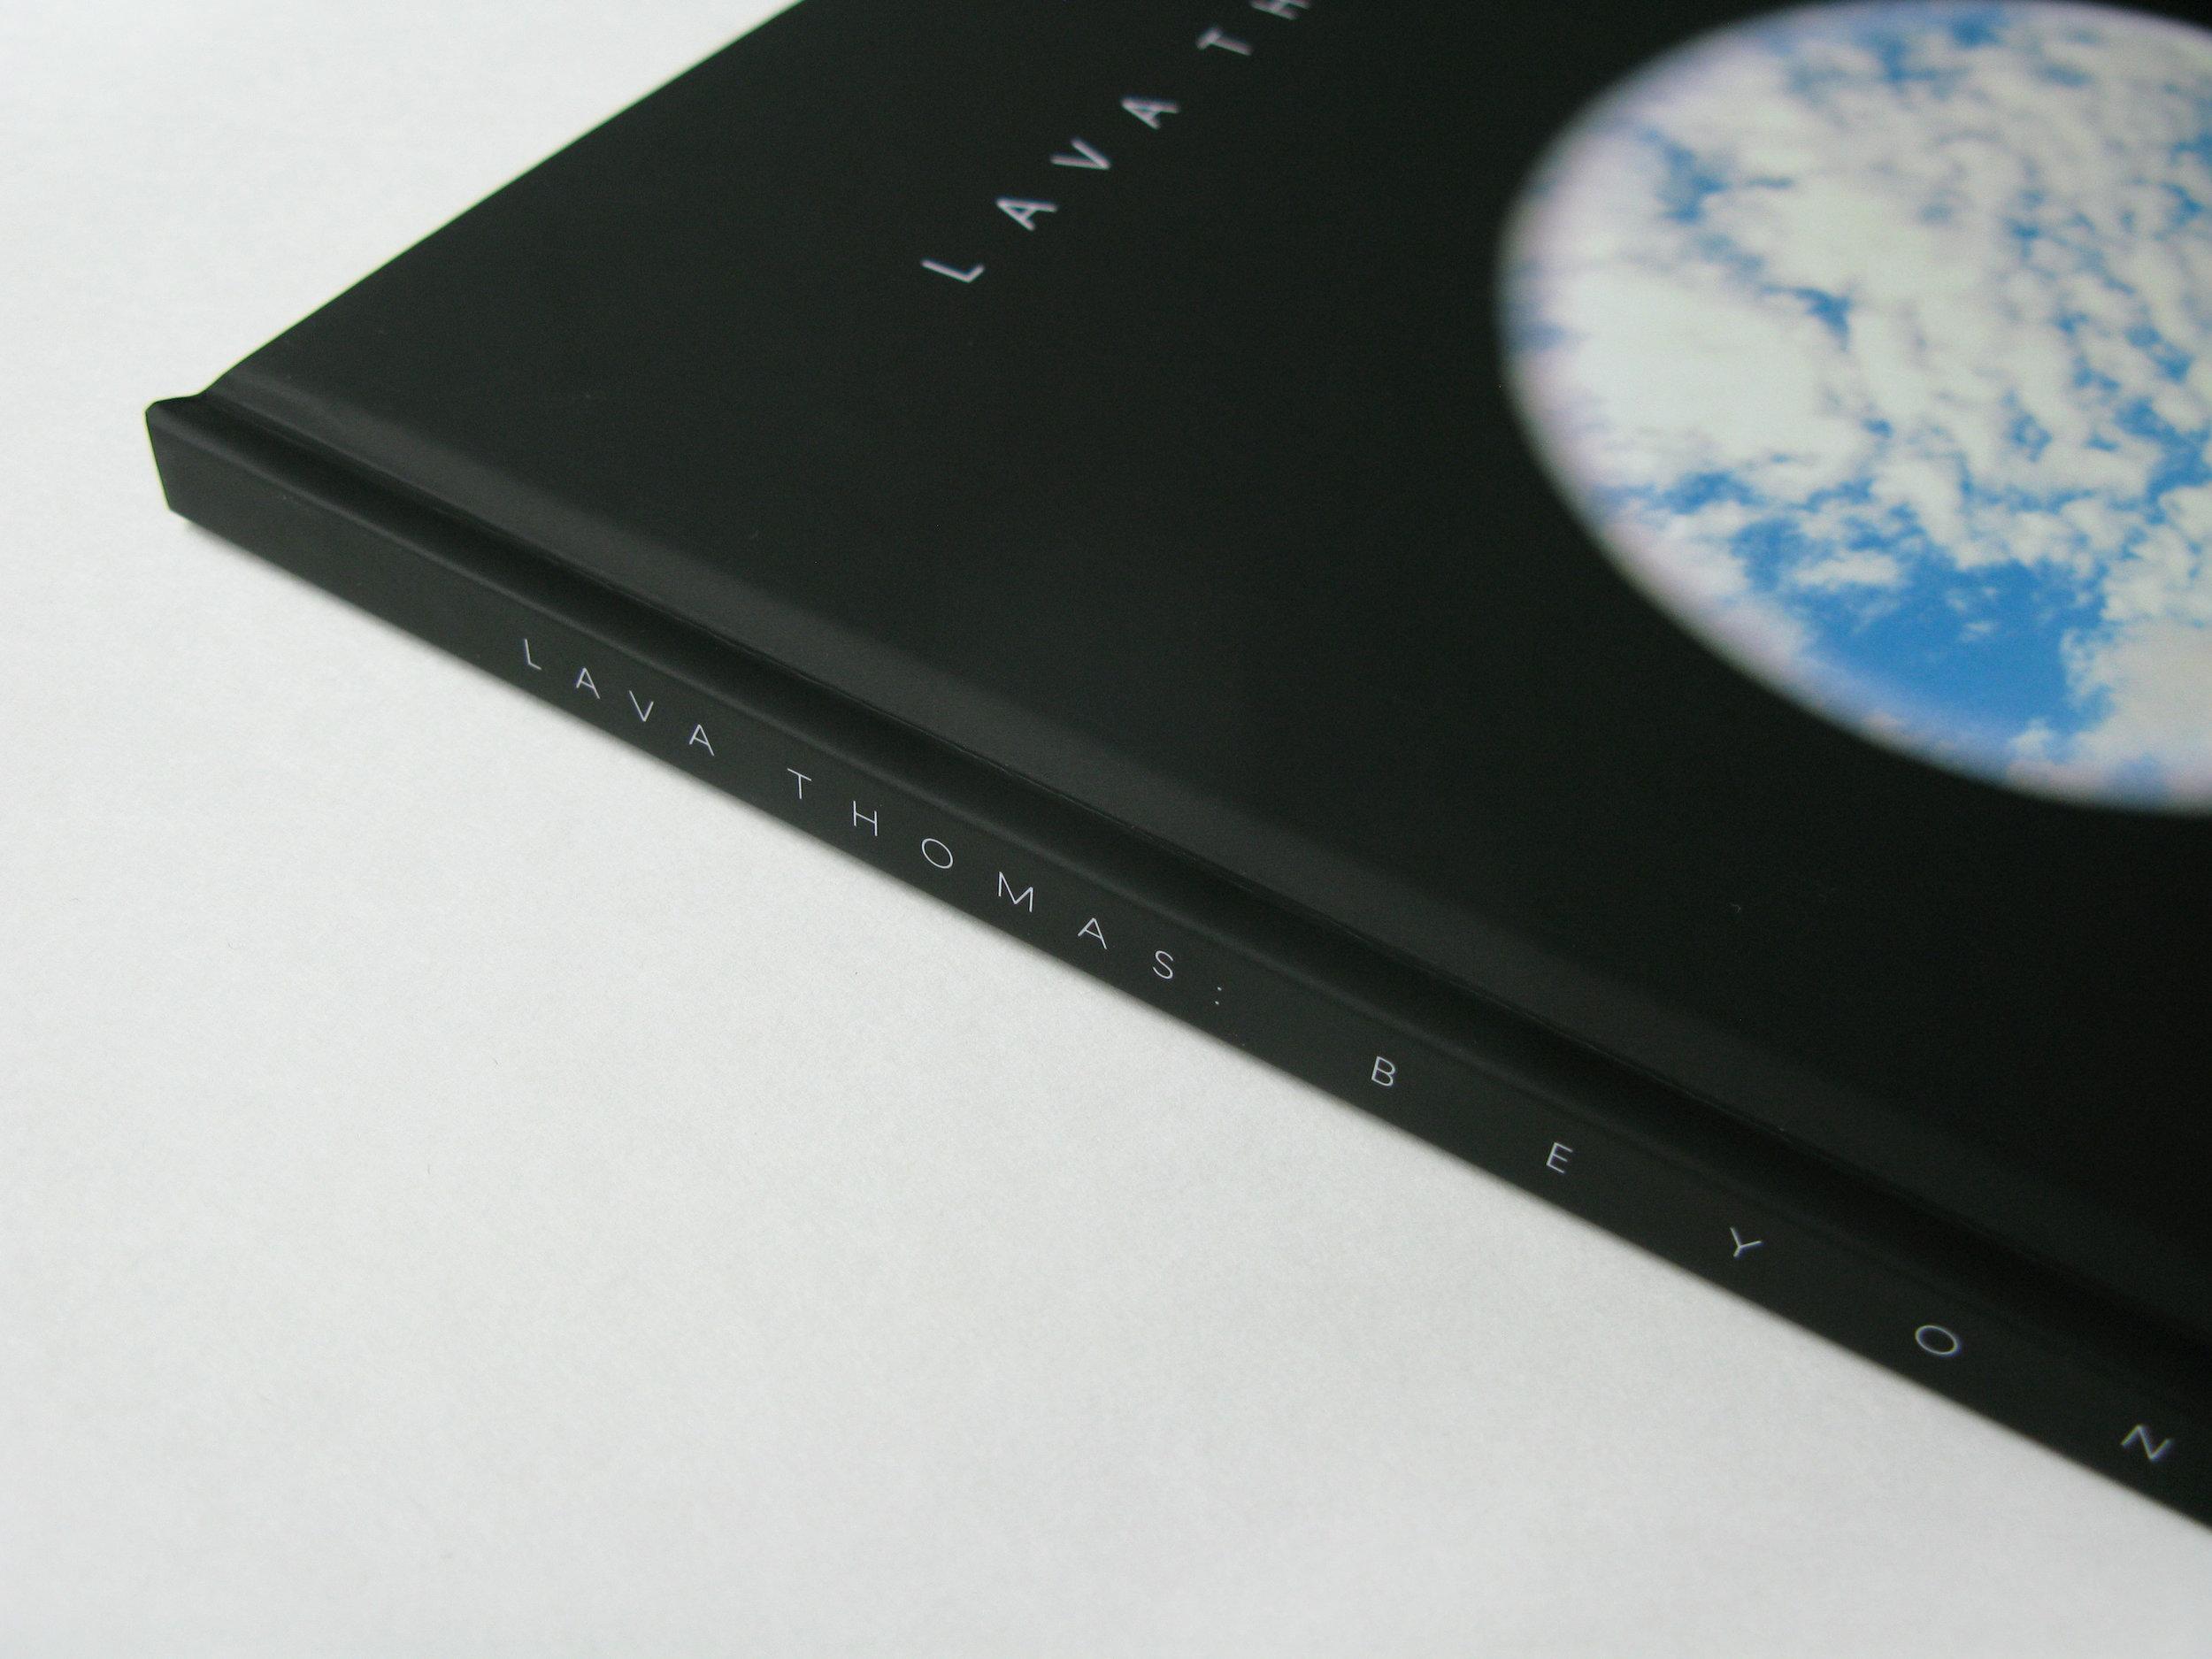 Lava-Thomas-Beyond-2014-IMG_9300.jpg